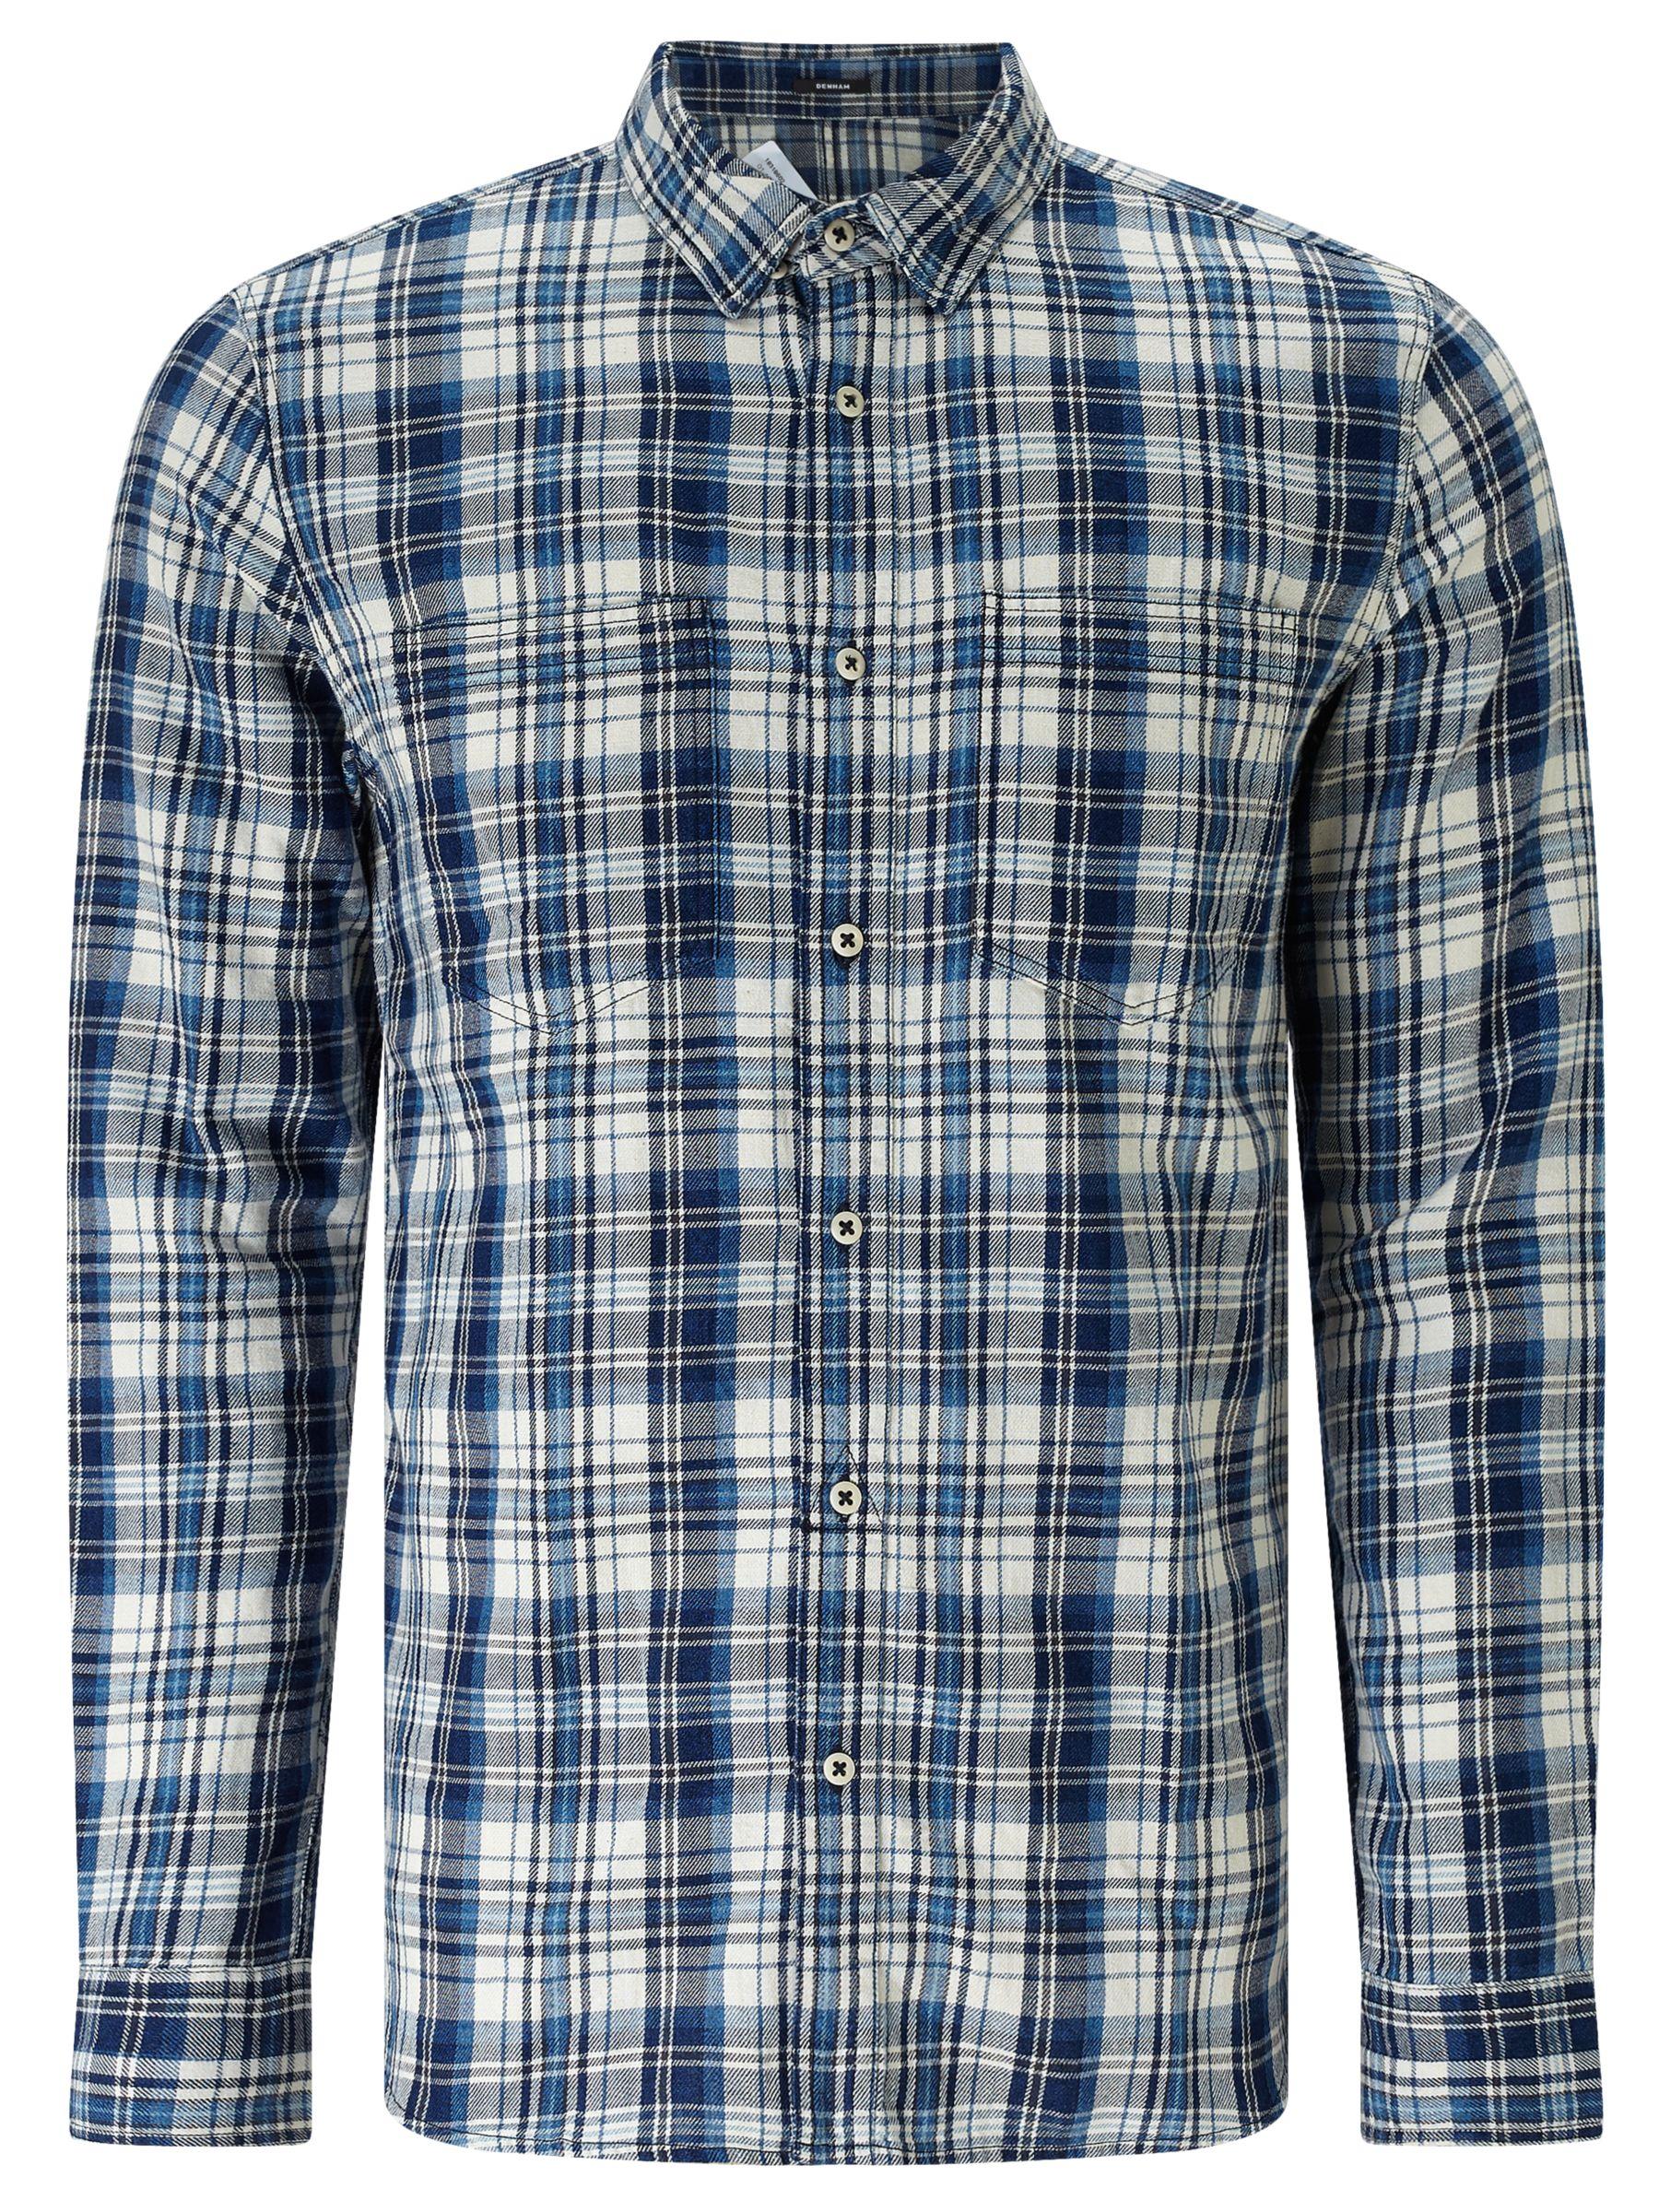 Denham Denham Edged Check Shirt TPL, Indigo